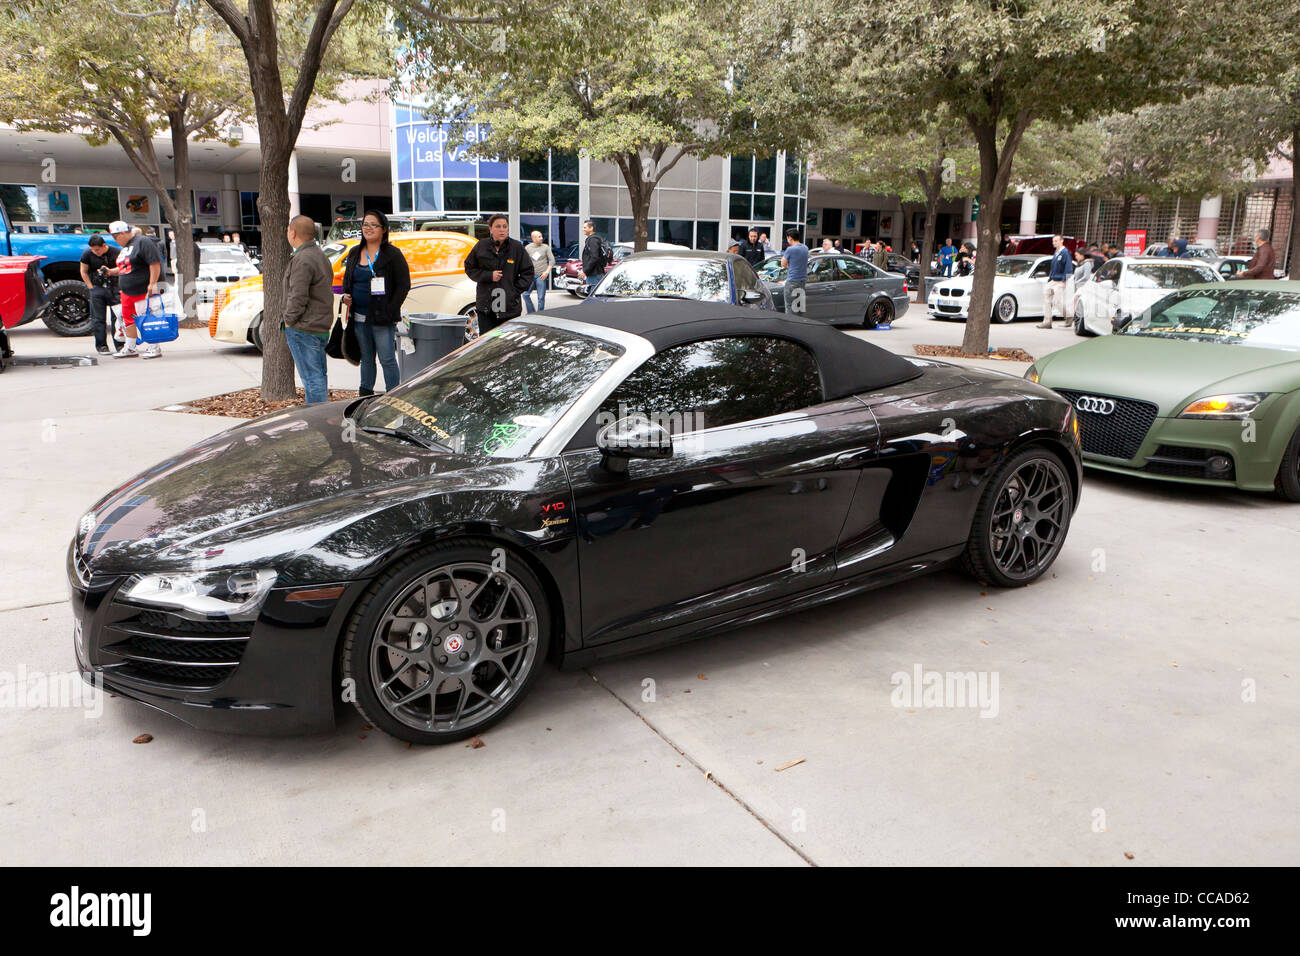 Audi R8 sports car - Stock Image